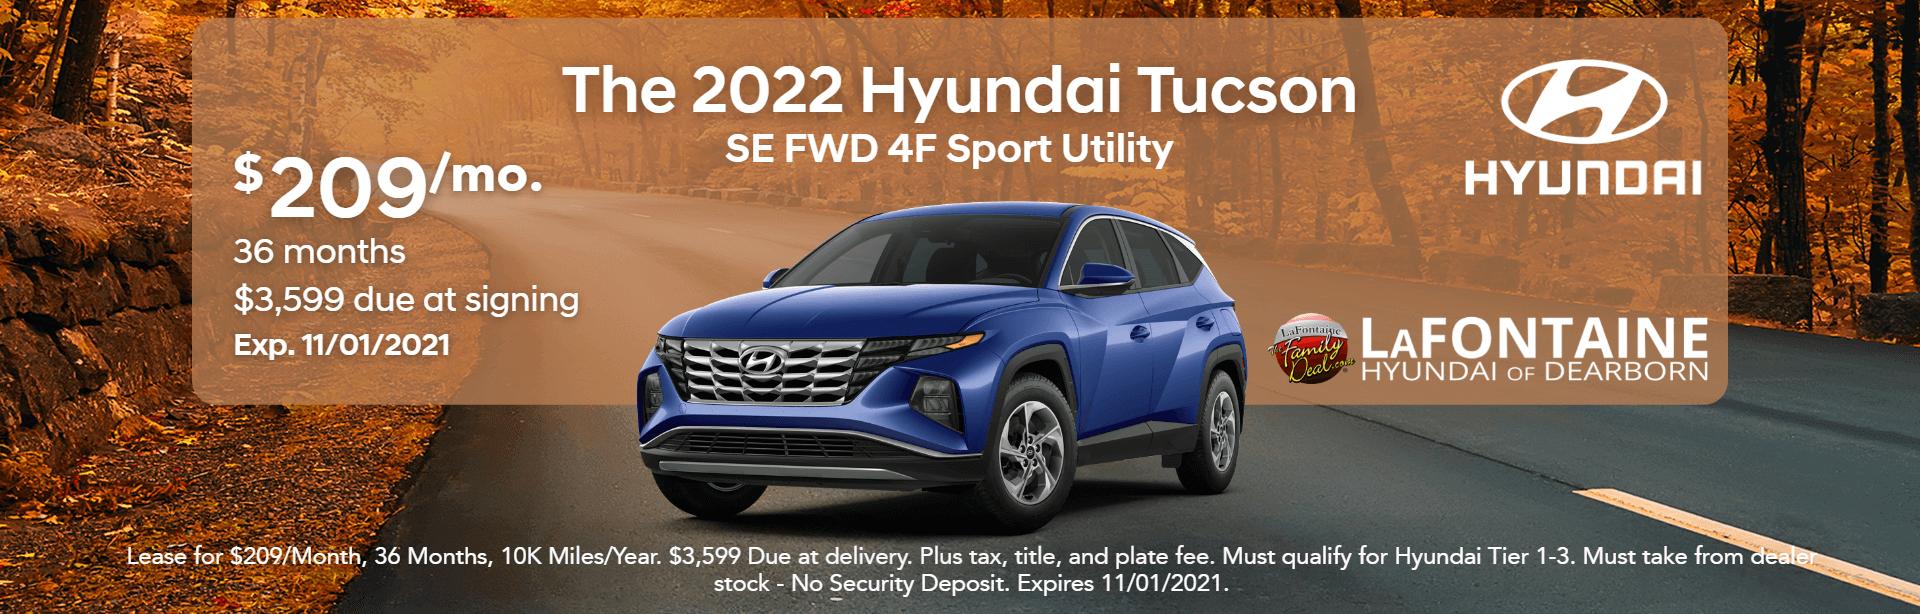 2022_Hyundai_Tucson_SE_Wed Oct 13 2021 13_04_34 GMT-0400 (Eastern Daylight Time)